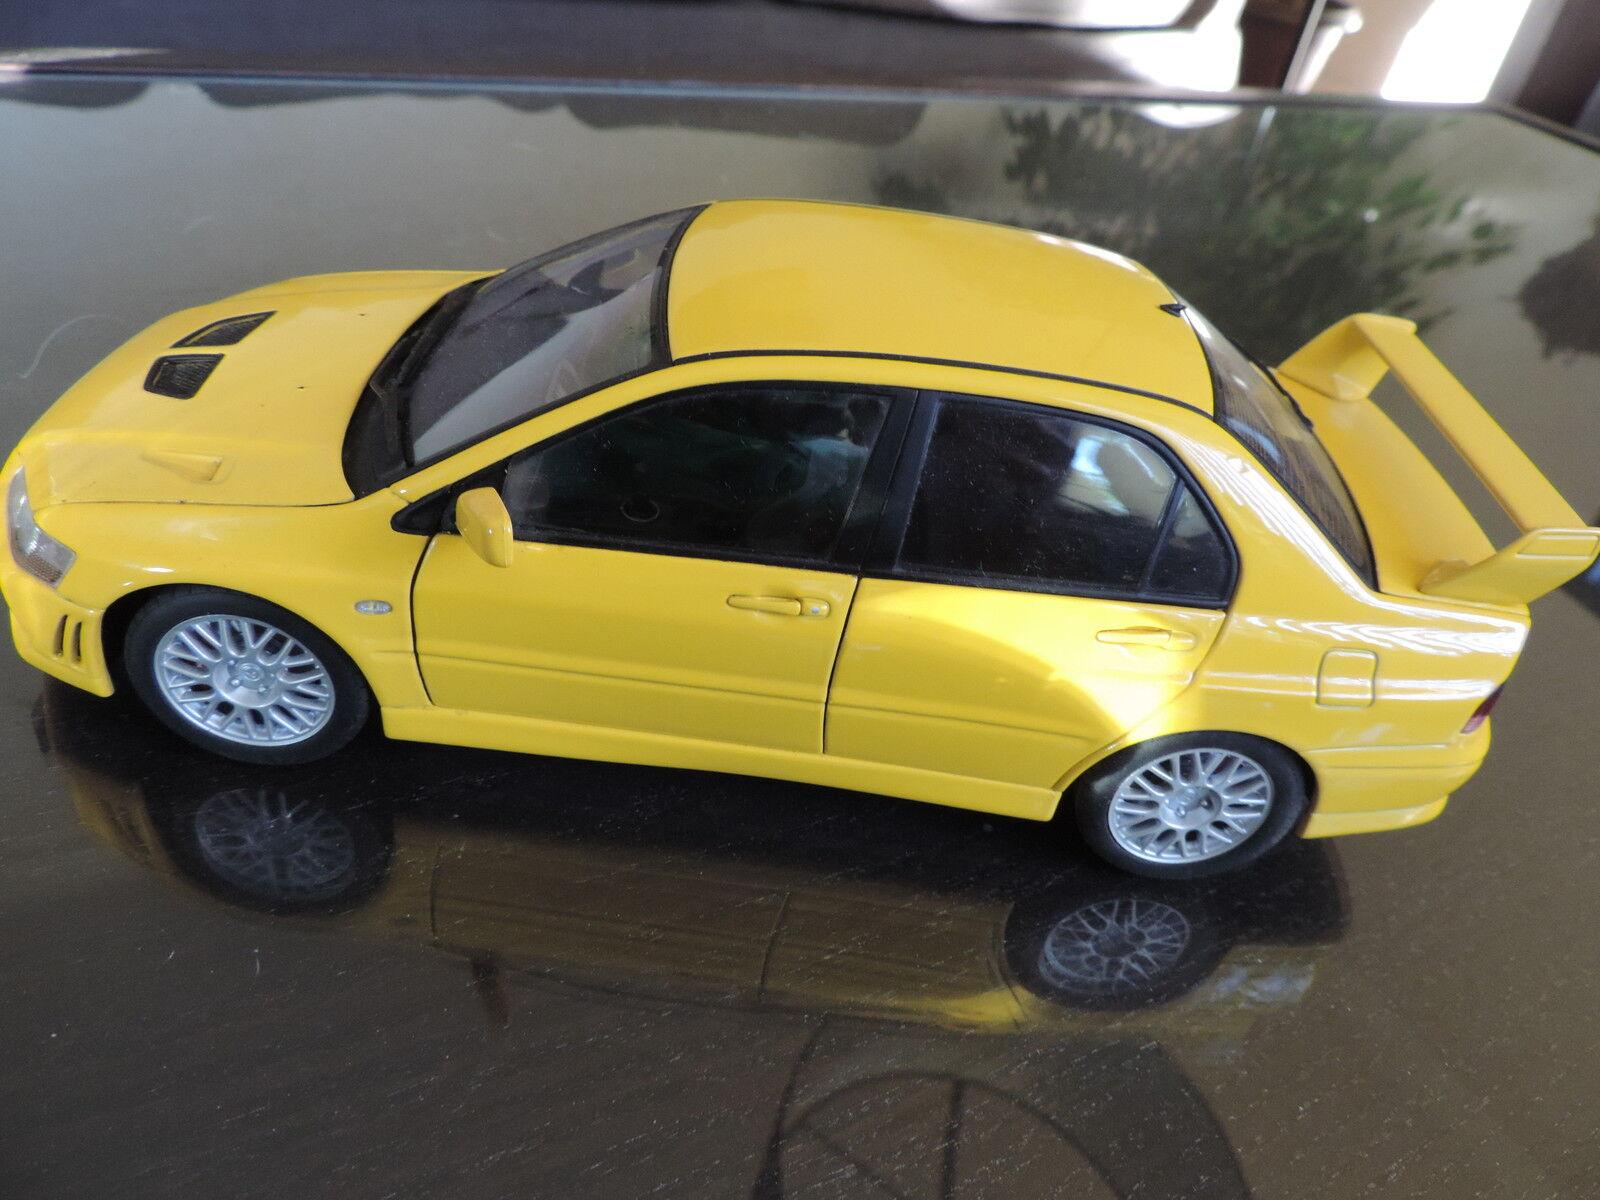 MITSUBISHI LANCER EVO VII EVO 7 jaune 1 18 AUTOART Auto Art